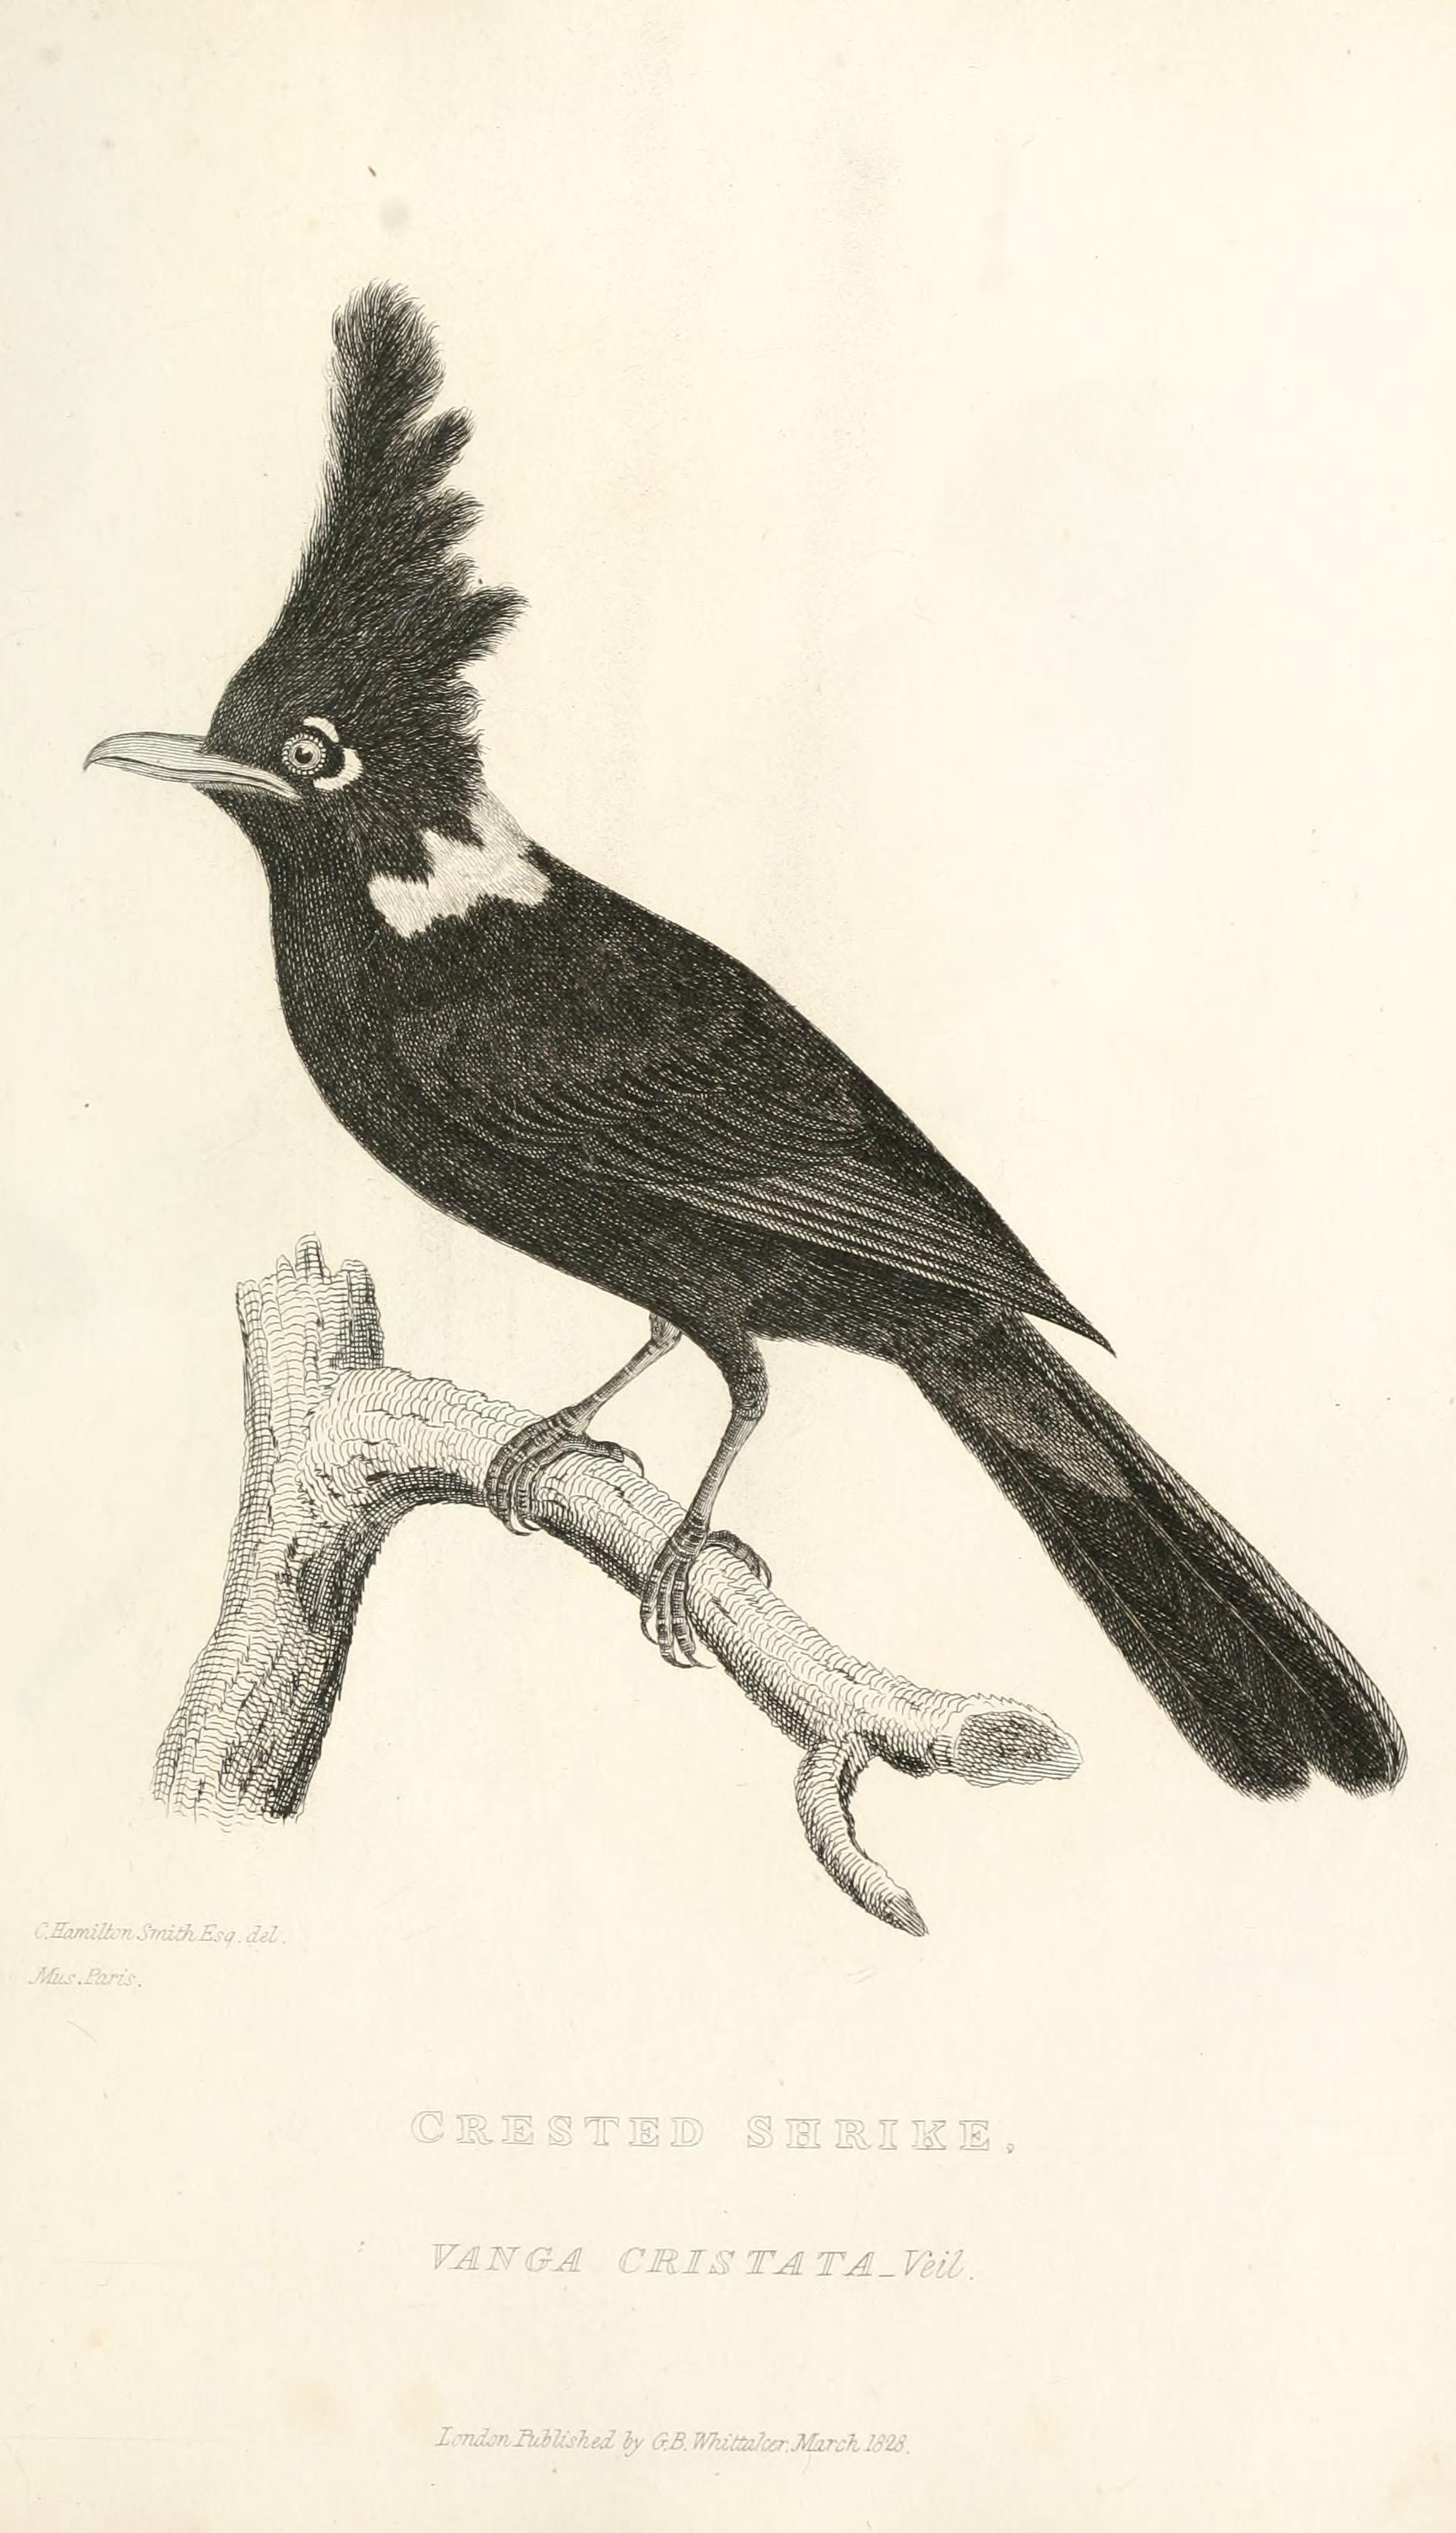 http://www.corvids.de/cld/images/Type_Platylophus_galericulatus-Vanga_cristata.jpg